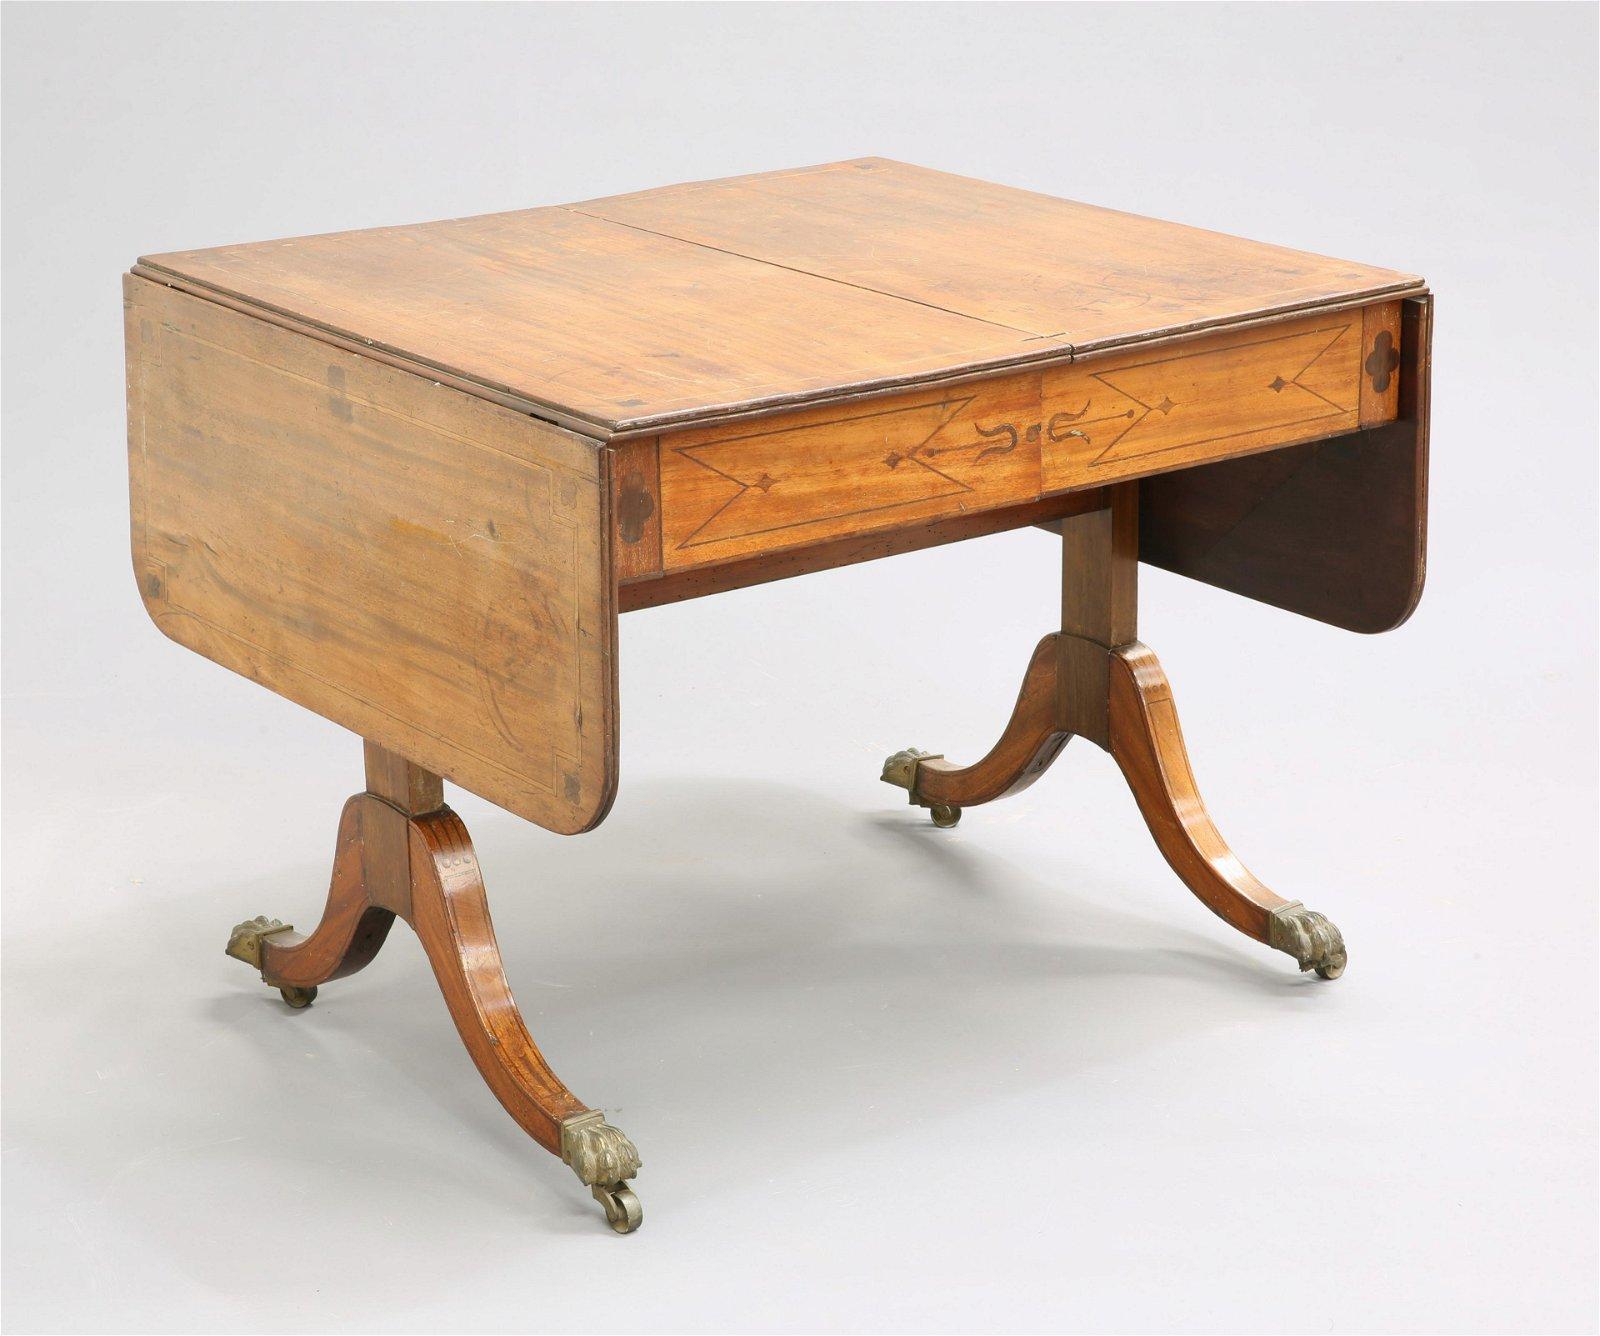 A REGENCY INLAID MAHOGANY SOFA TABLE, a pair of frieze